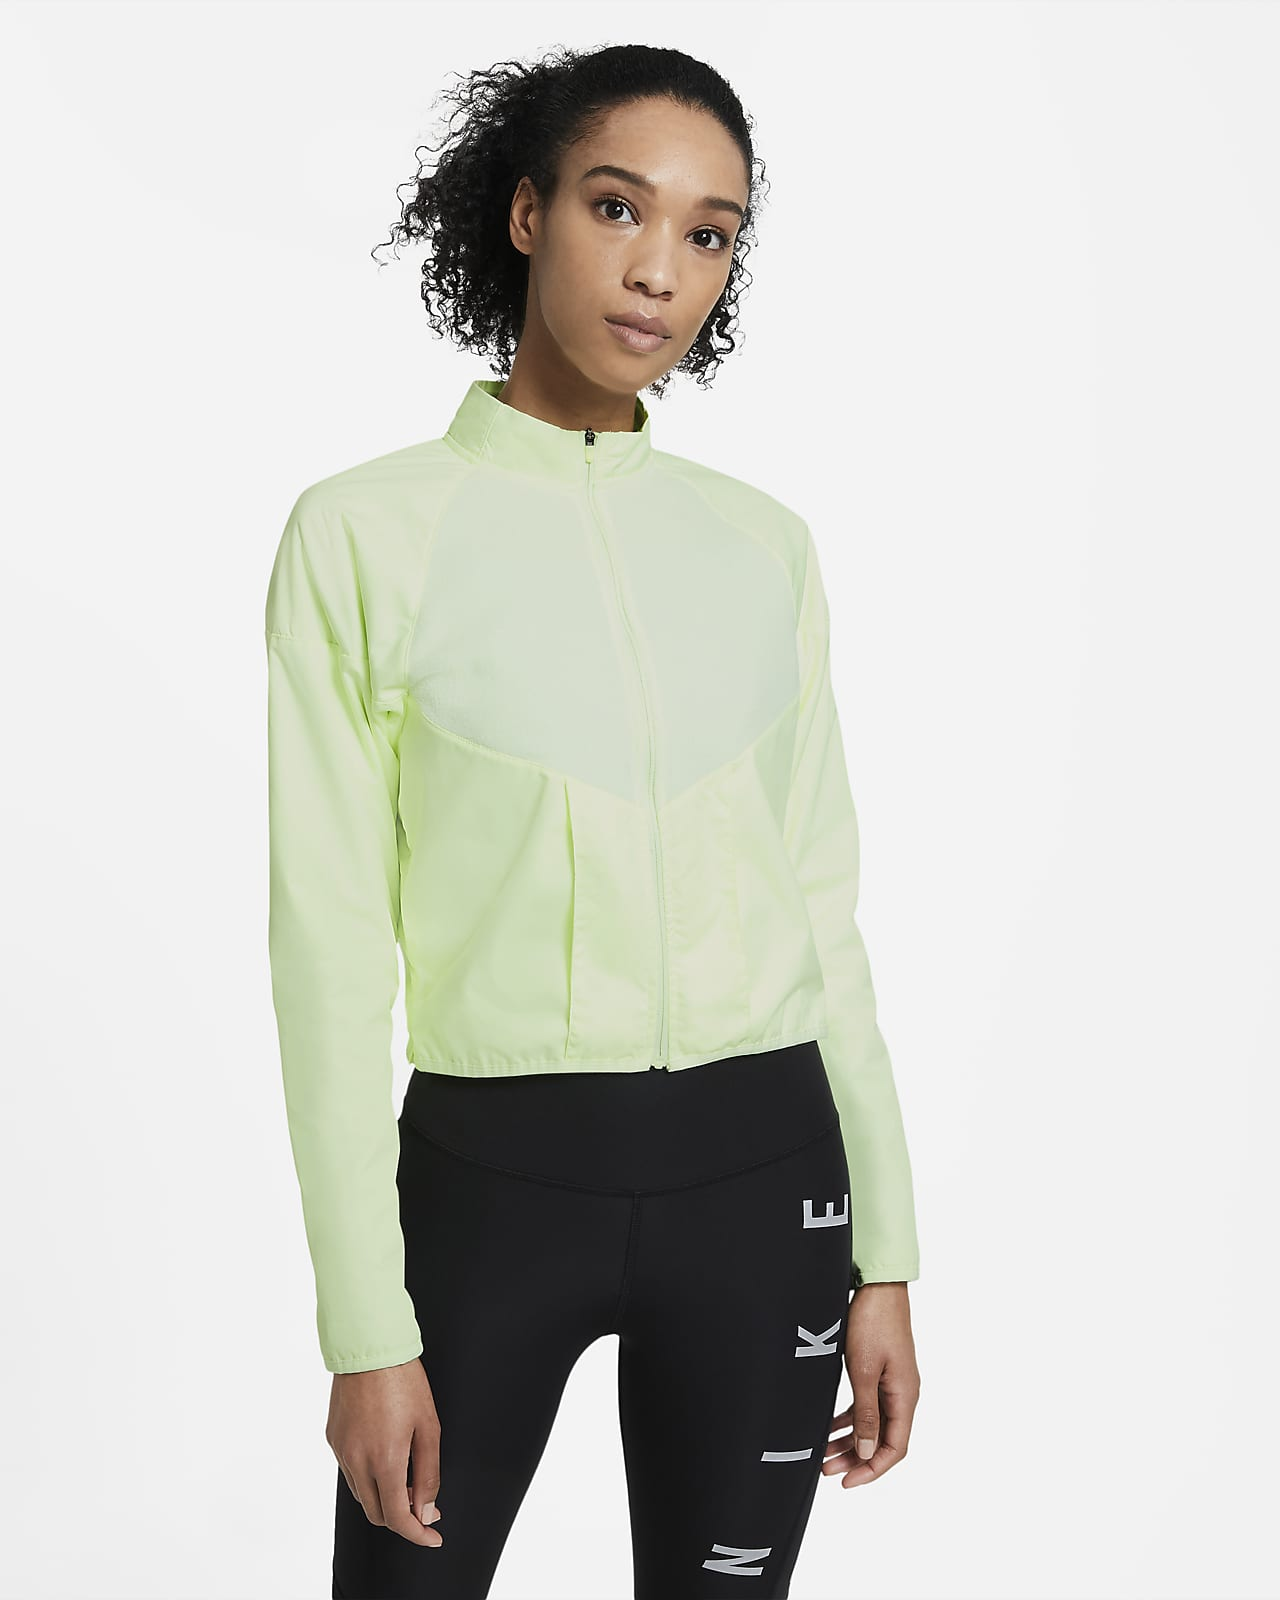 Nike Run Division Women's Running Top